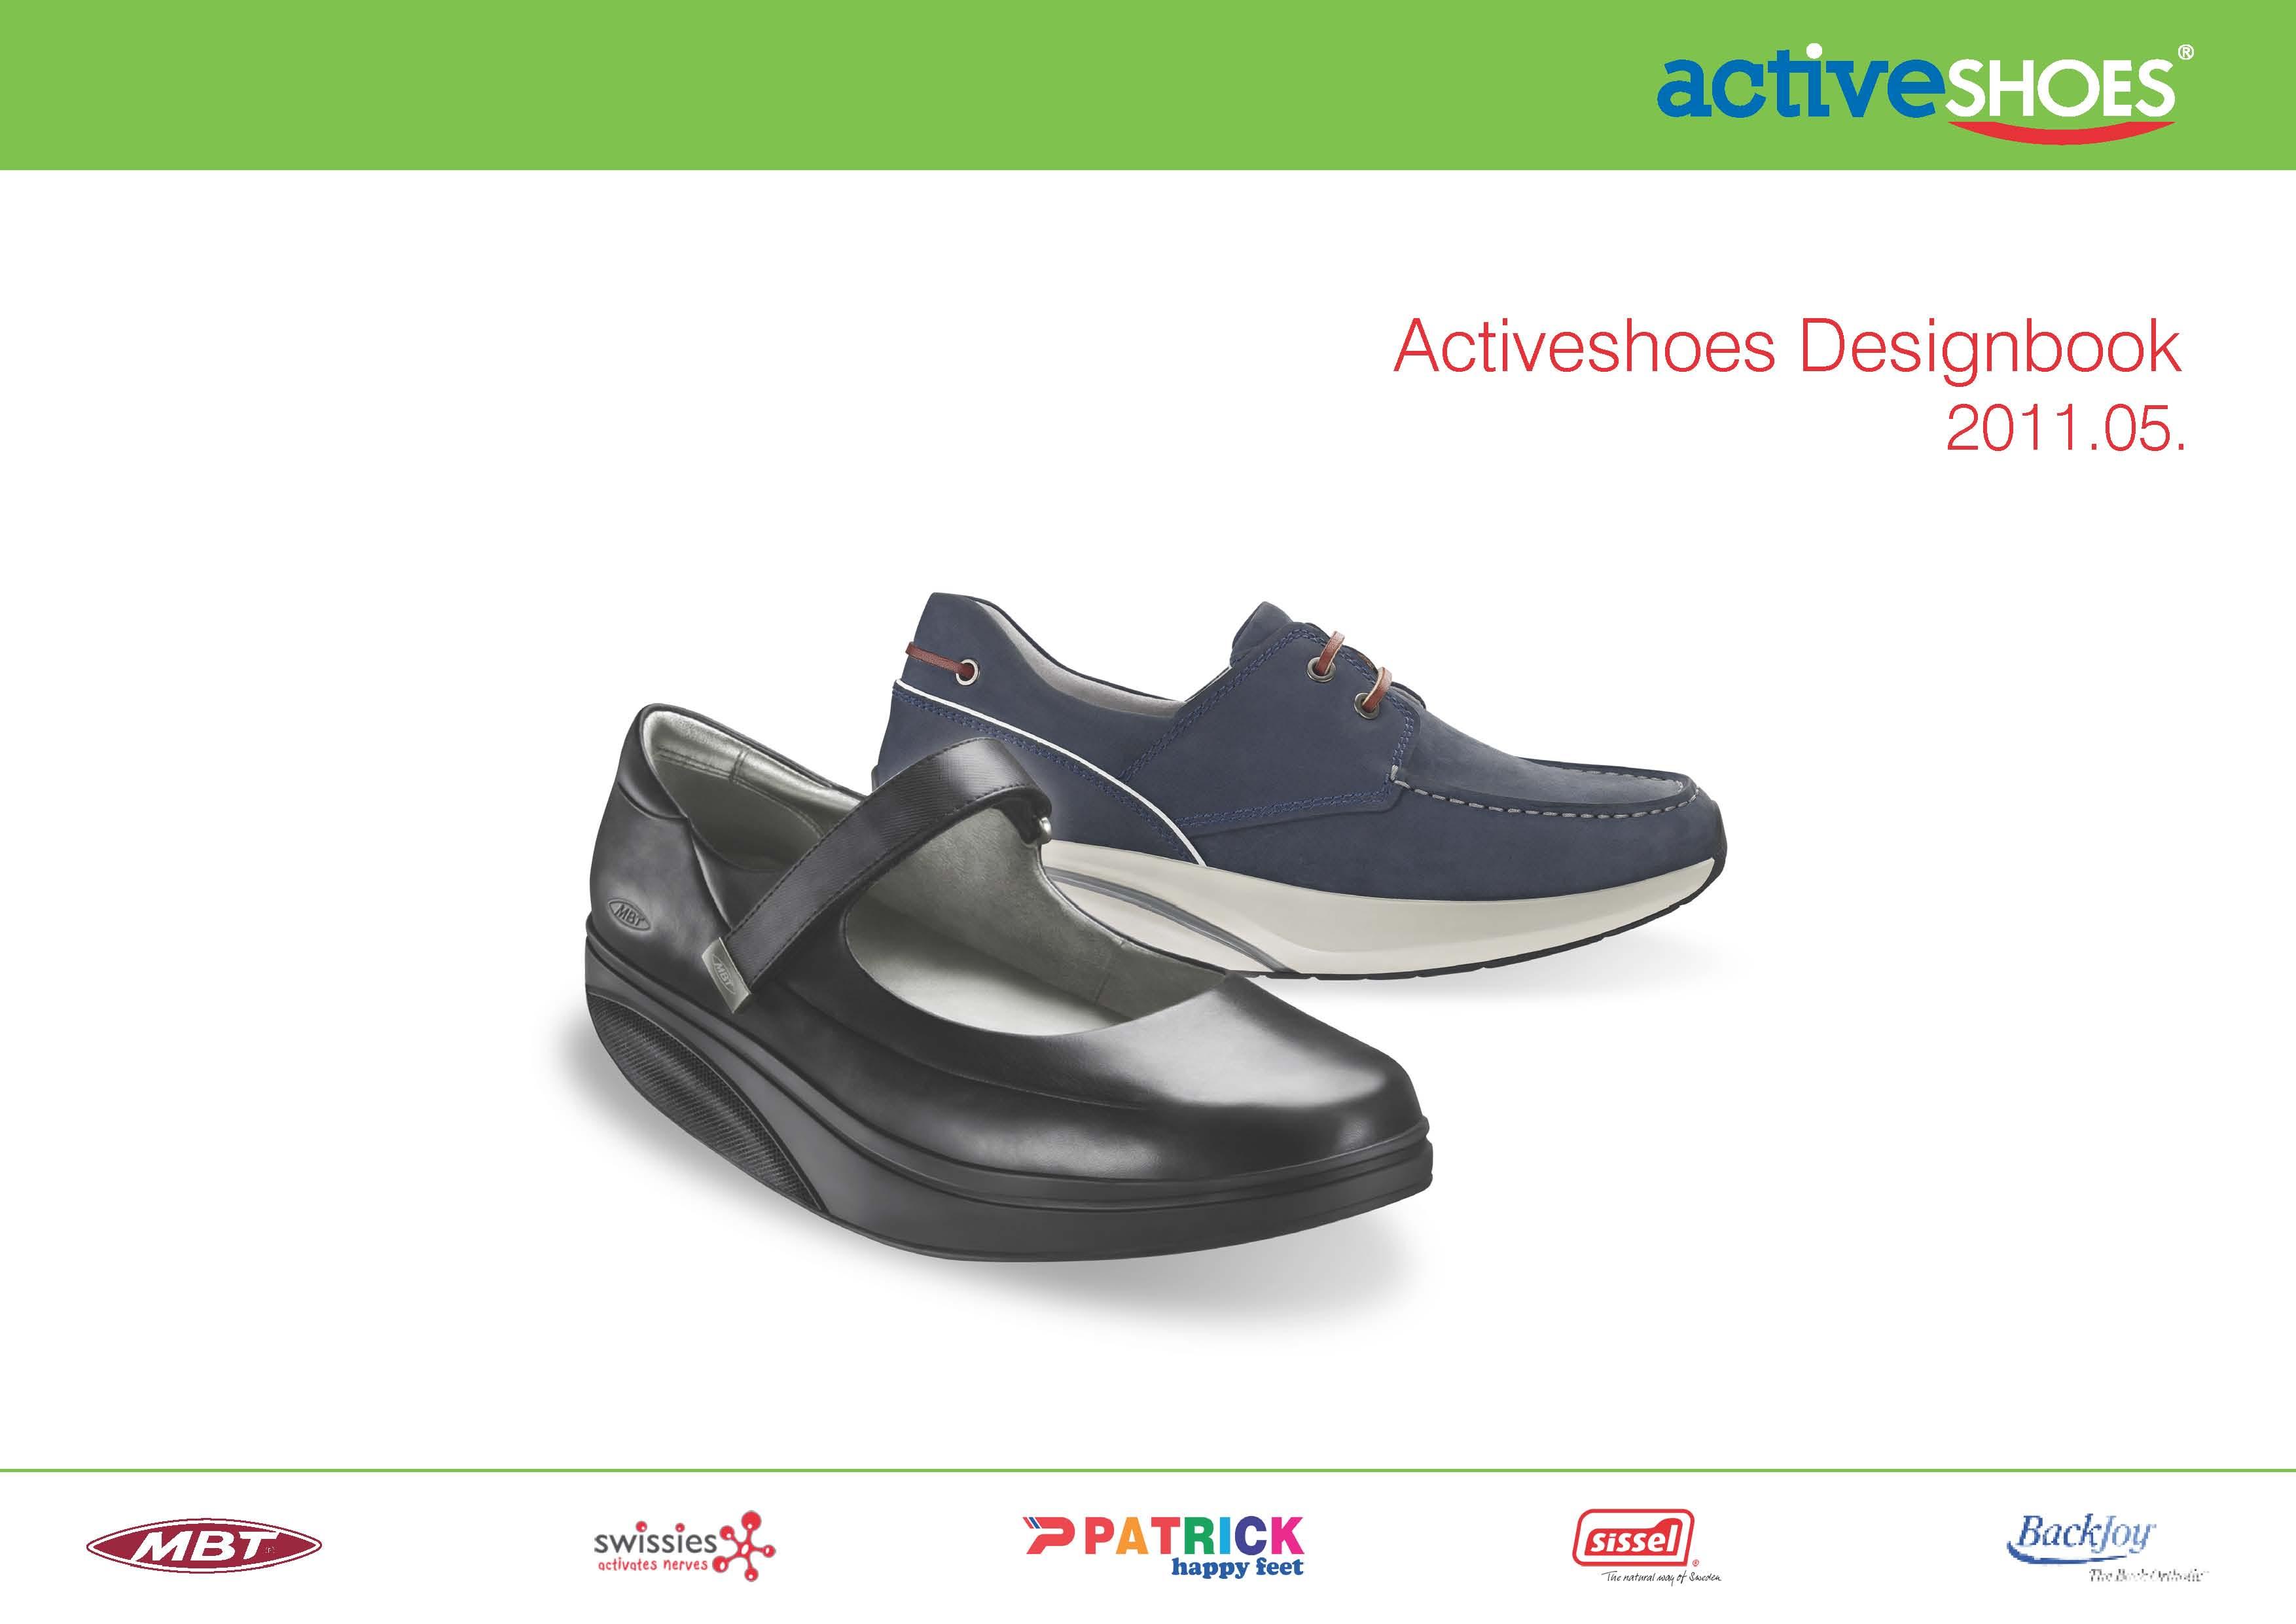 activeshoes_designbook_2011_07_A4-es_4_Page_01